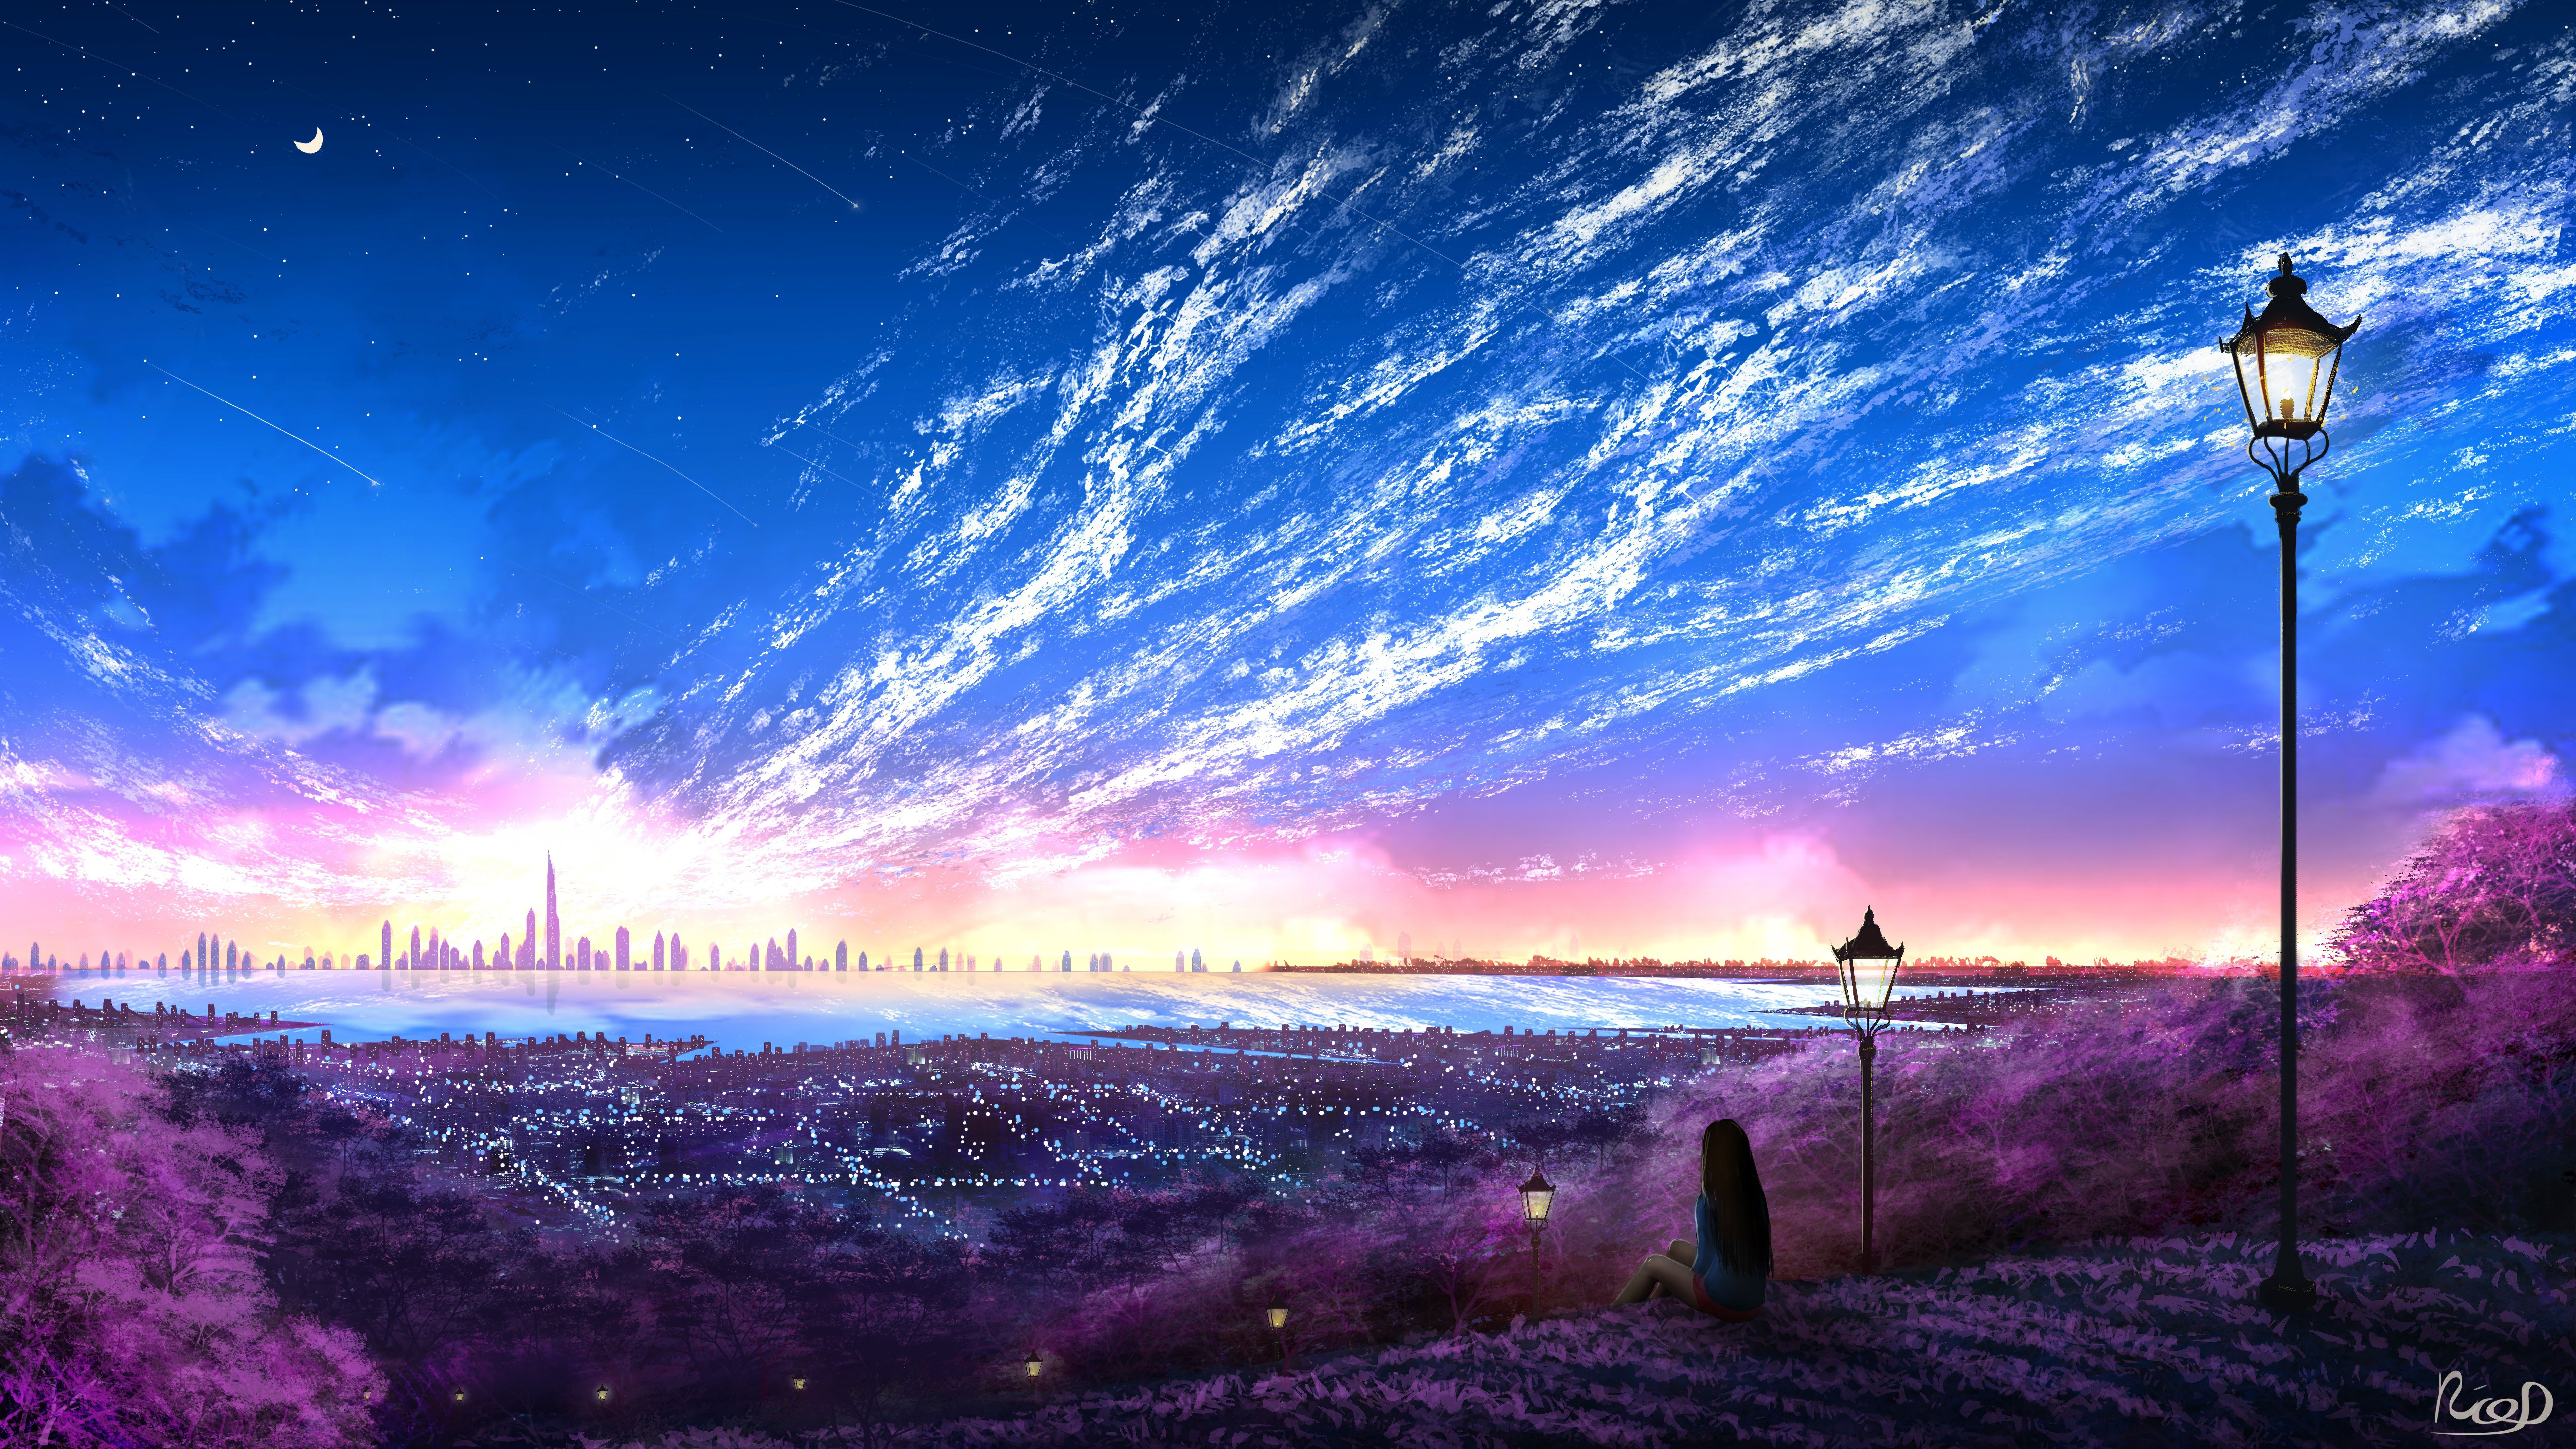 Hd Ultra Hd 4k Uhd Anime Wallpaper 4k Images Hd Anime Wallpapers Anime Wallpaper 1080p Anime Wallpaper